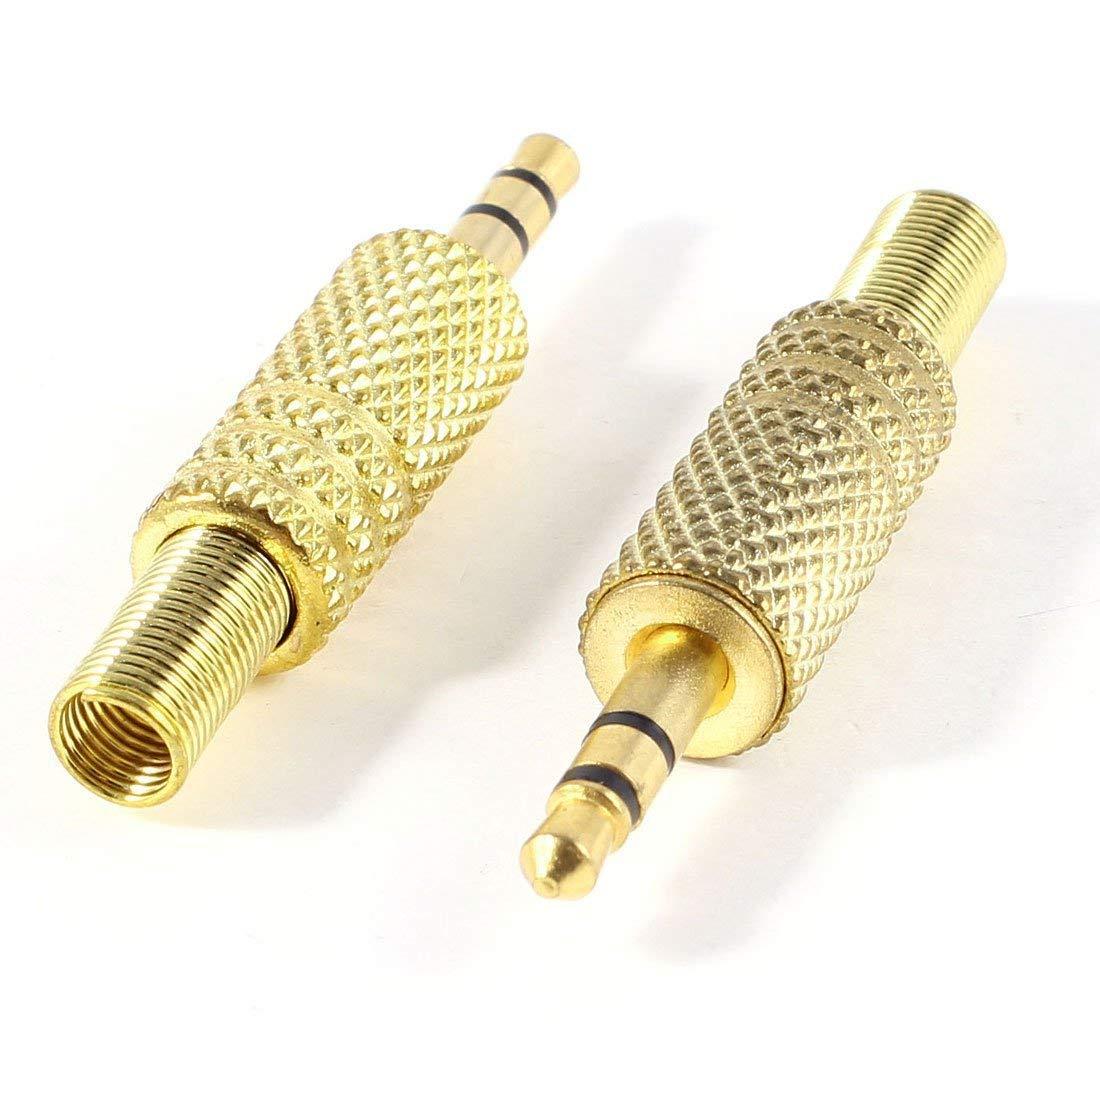 "SODIAL(R) 2 Pcs Gold Tone Alloy 3.5mm 1/8"" Male Jack Plug Coax Cable Audio Connector"